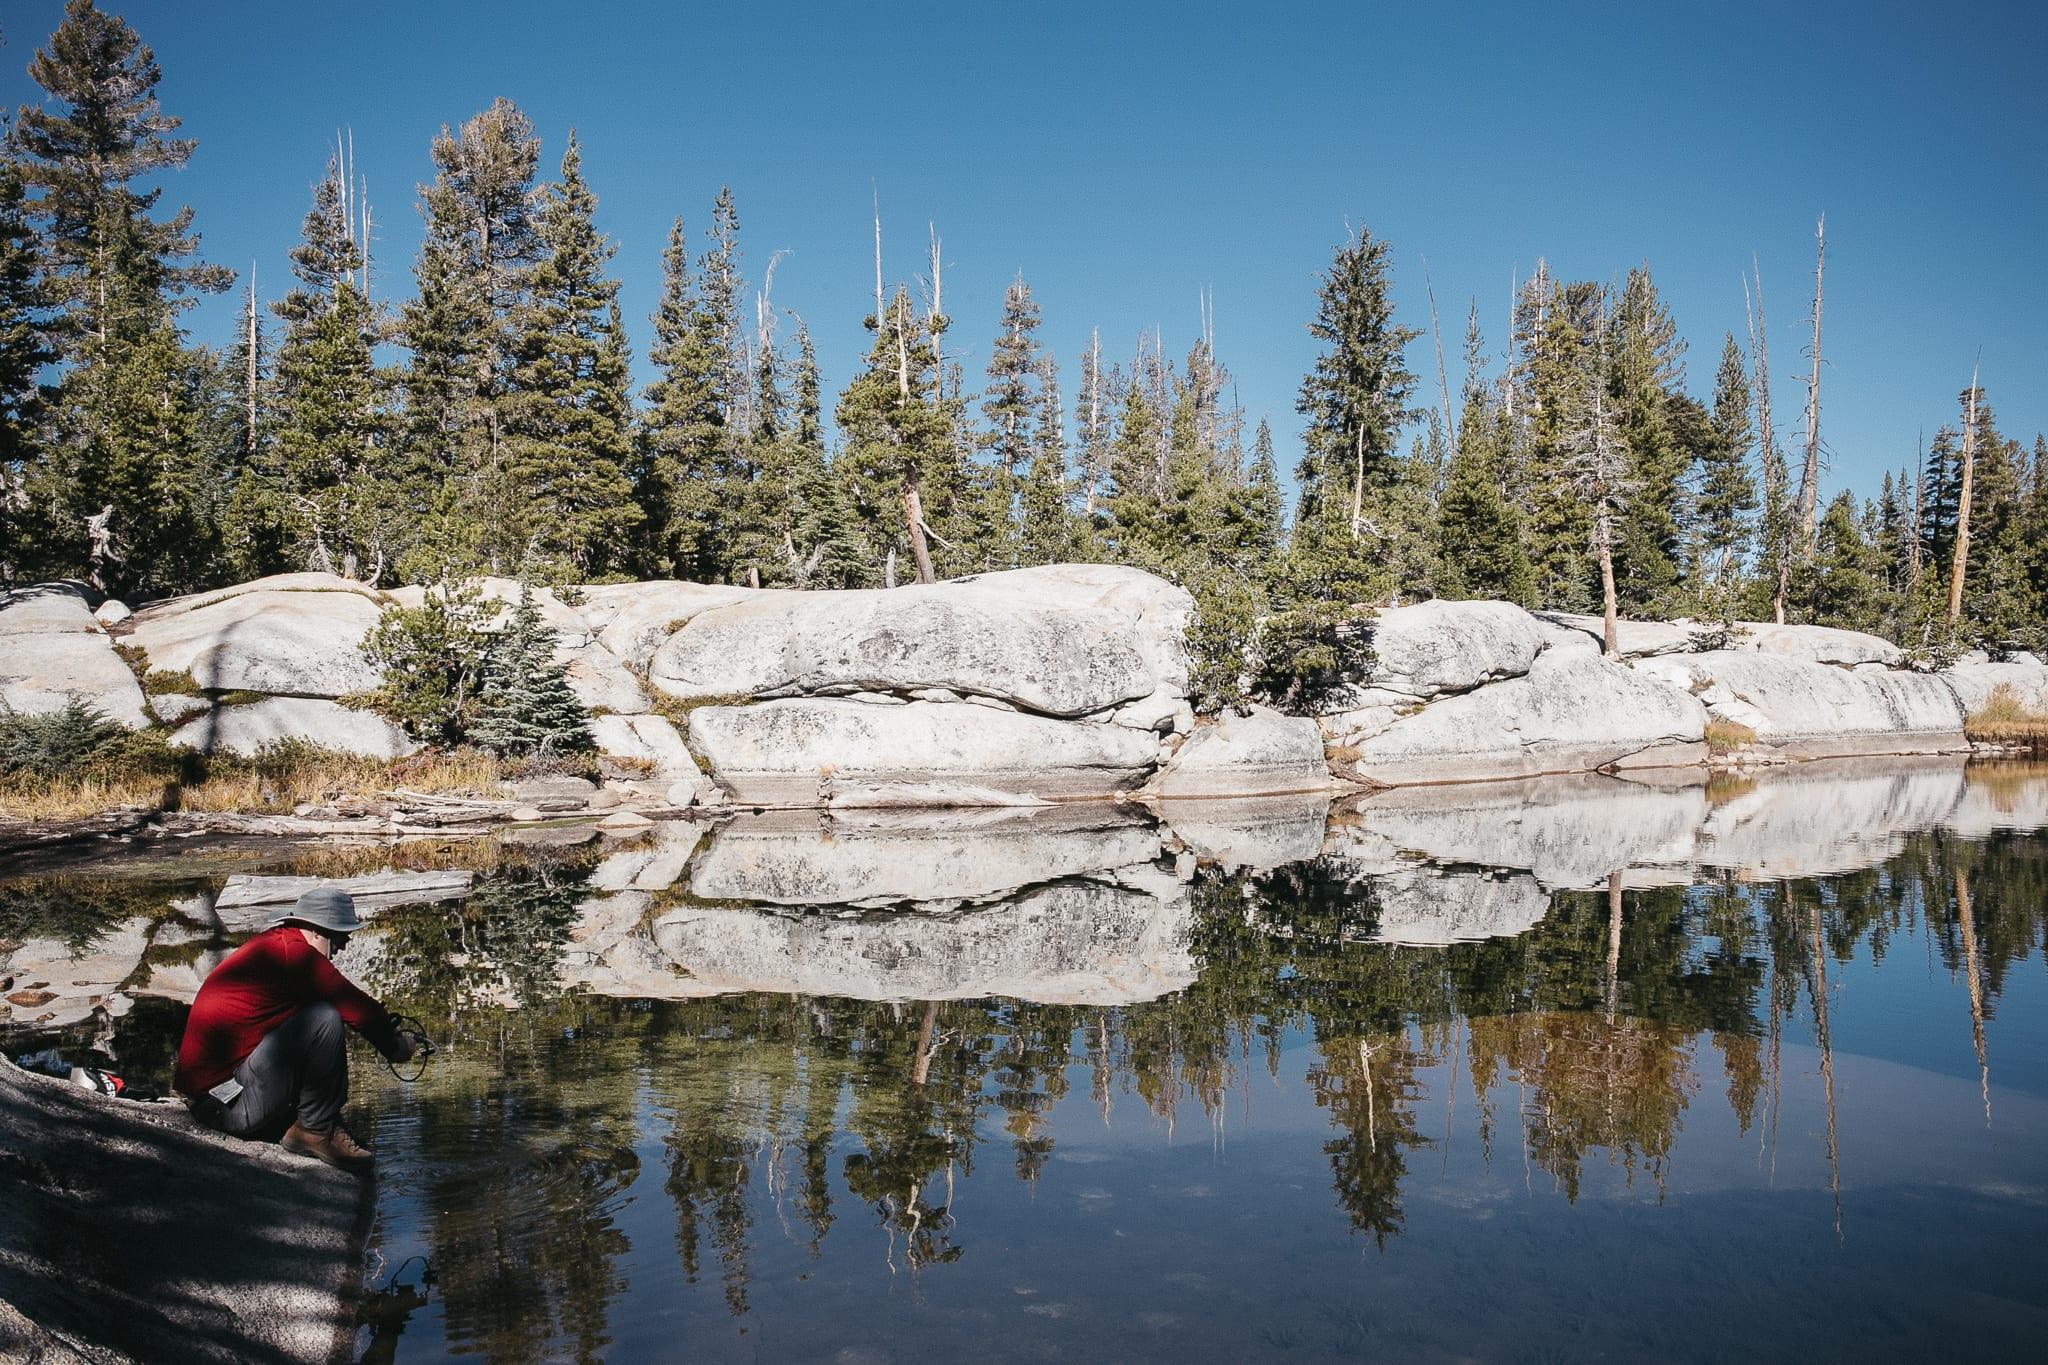 clouds-rest-yosemite-california-engagement-lifestyle-adventure-photographer-5